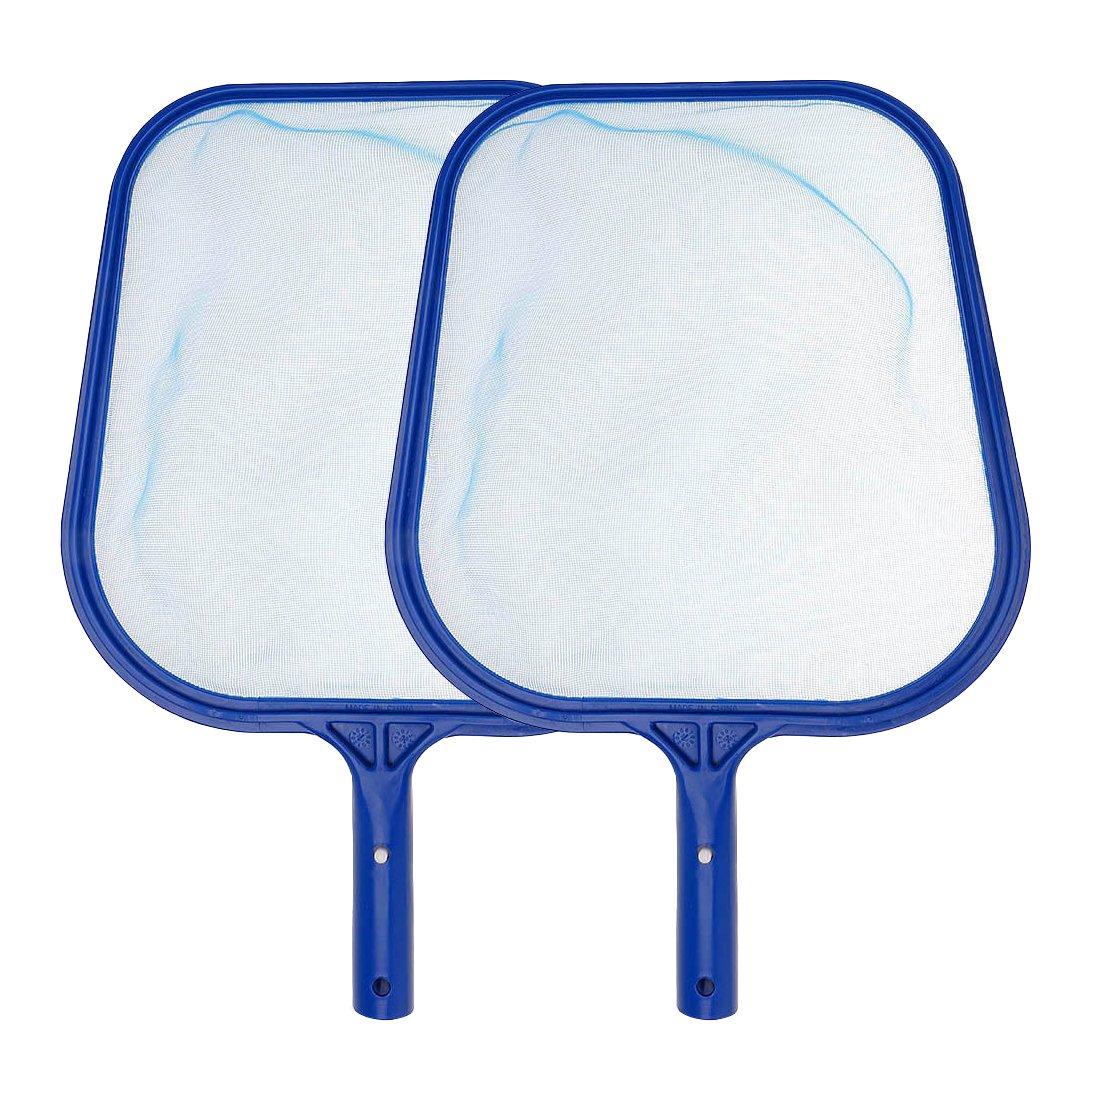 Oucan 2PC Pool Leaf Rake Net Swimming Pool Skimmer Net Pool Silt Rake Leaf Skimmer Net Pool Leaf Scoop Fine Mesh Skimmer for Cleaning Swimming Pool Leaves & Debris